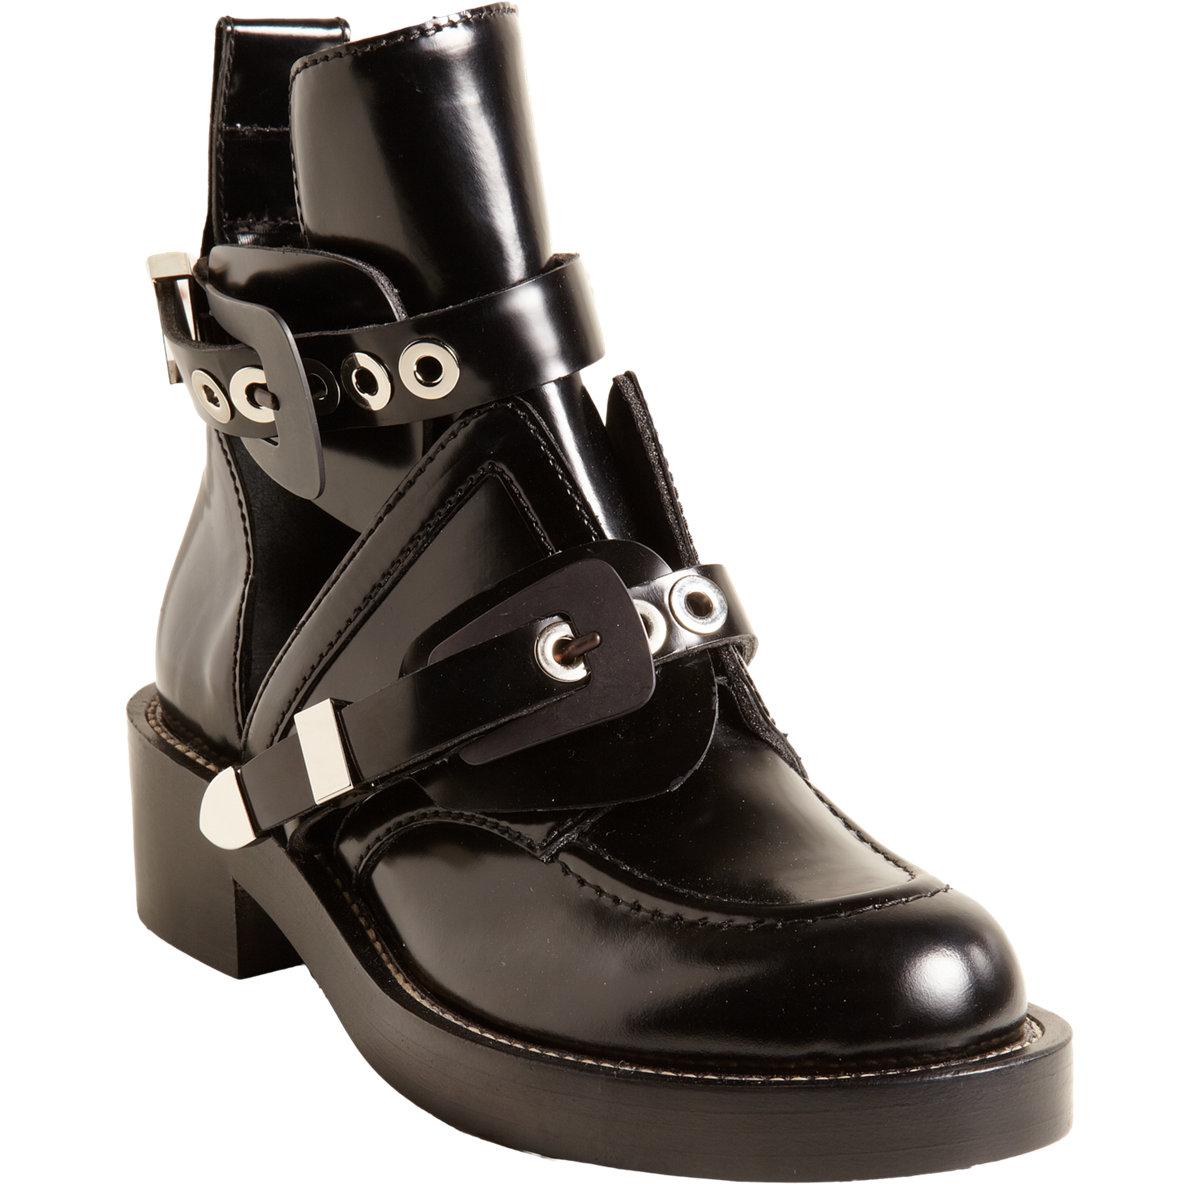 Balenciaga Buckle Strap Ankle Boot at Barneys.com